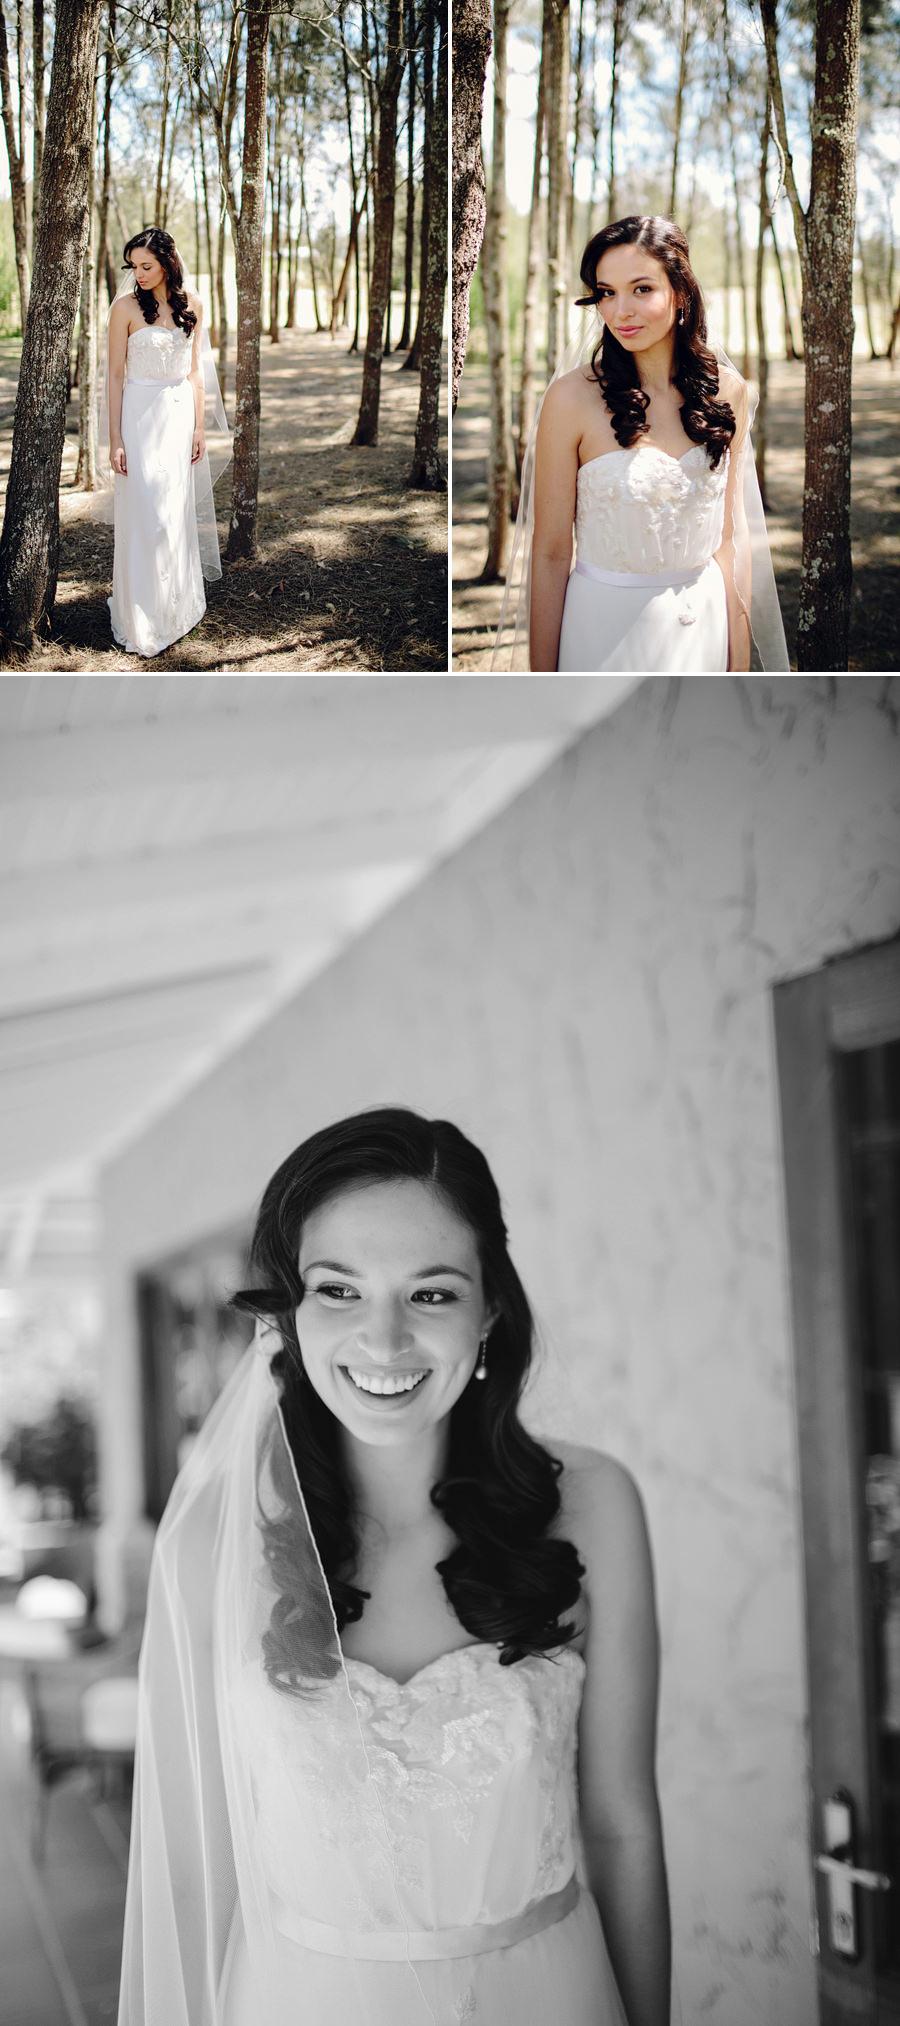 Fine Art Wedding Photographers: Bridal portraits